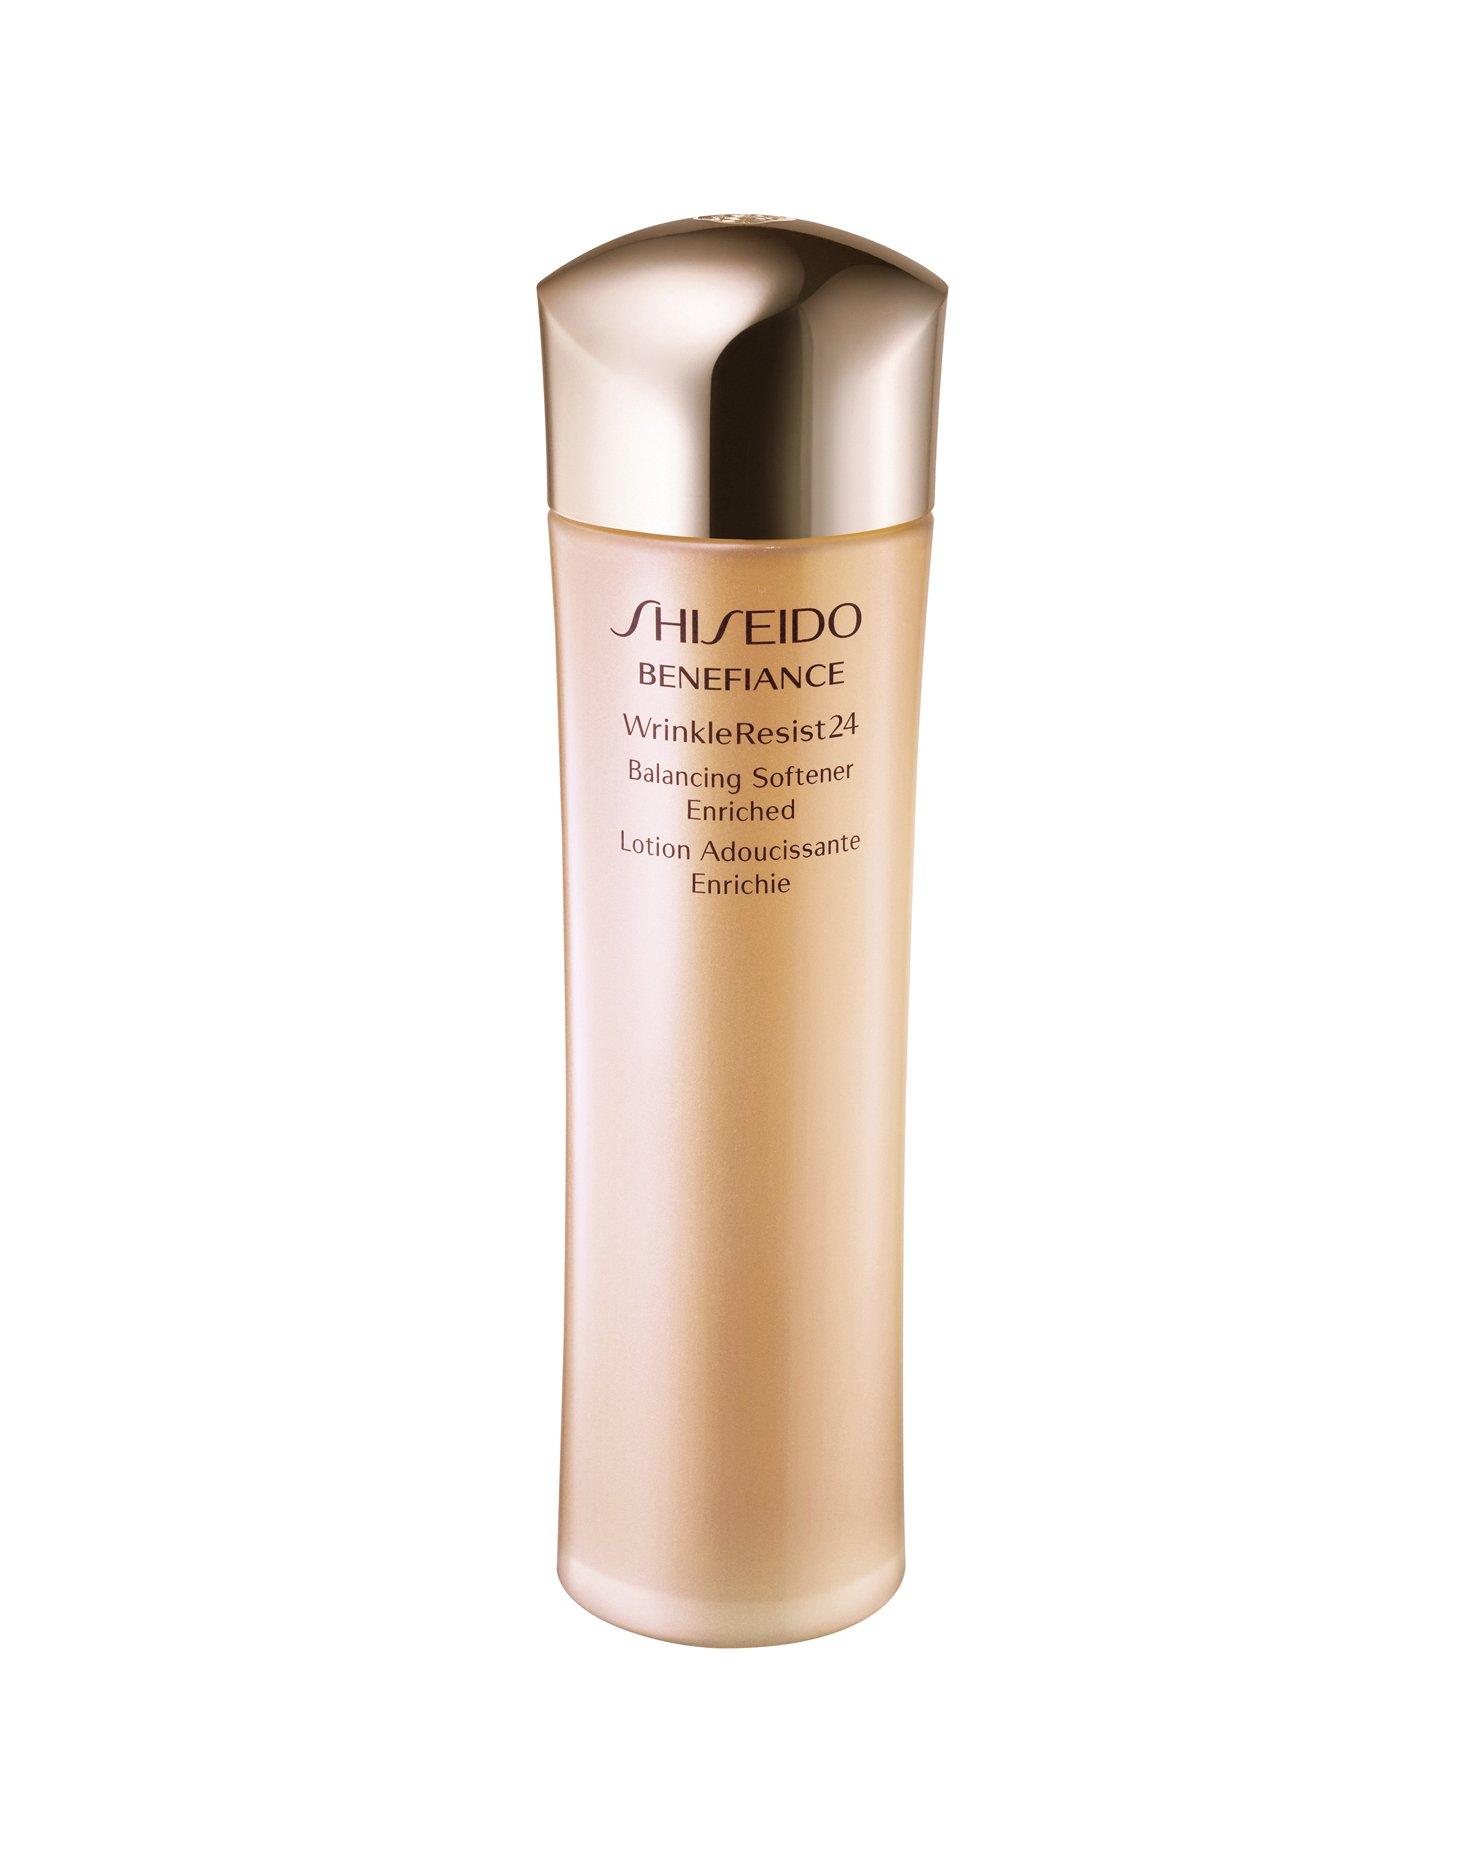 Shiseido Benefiance Wrinkleresist24 Balancing Softener Enriched for Unisex, 5 Ounce by Shiseido